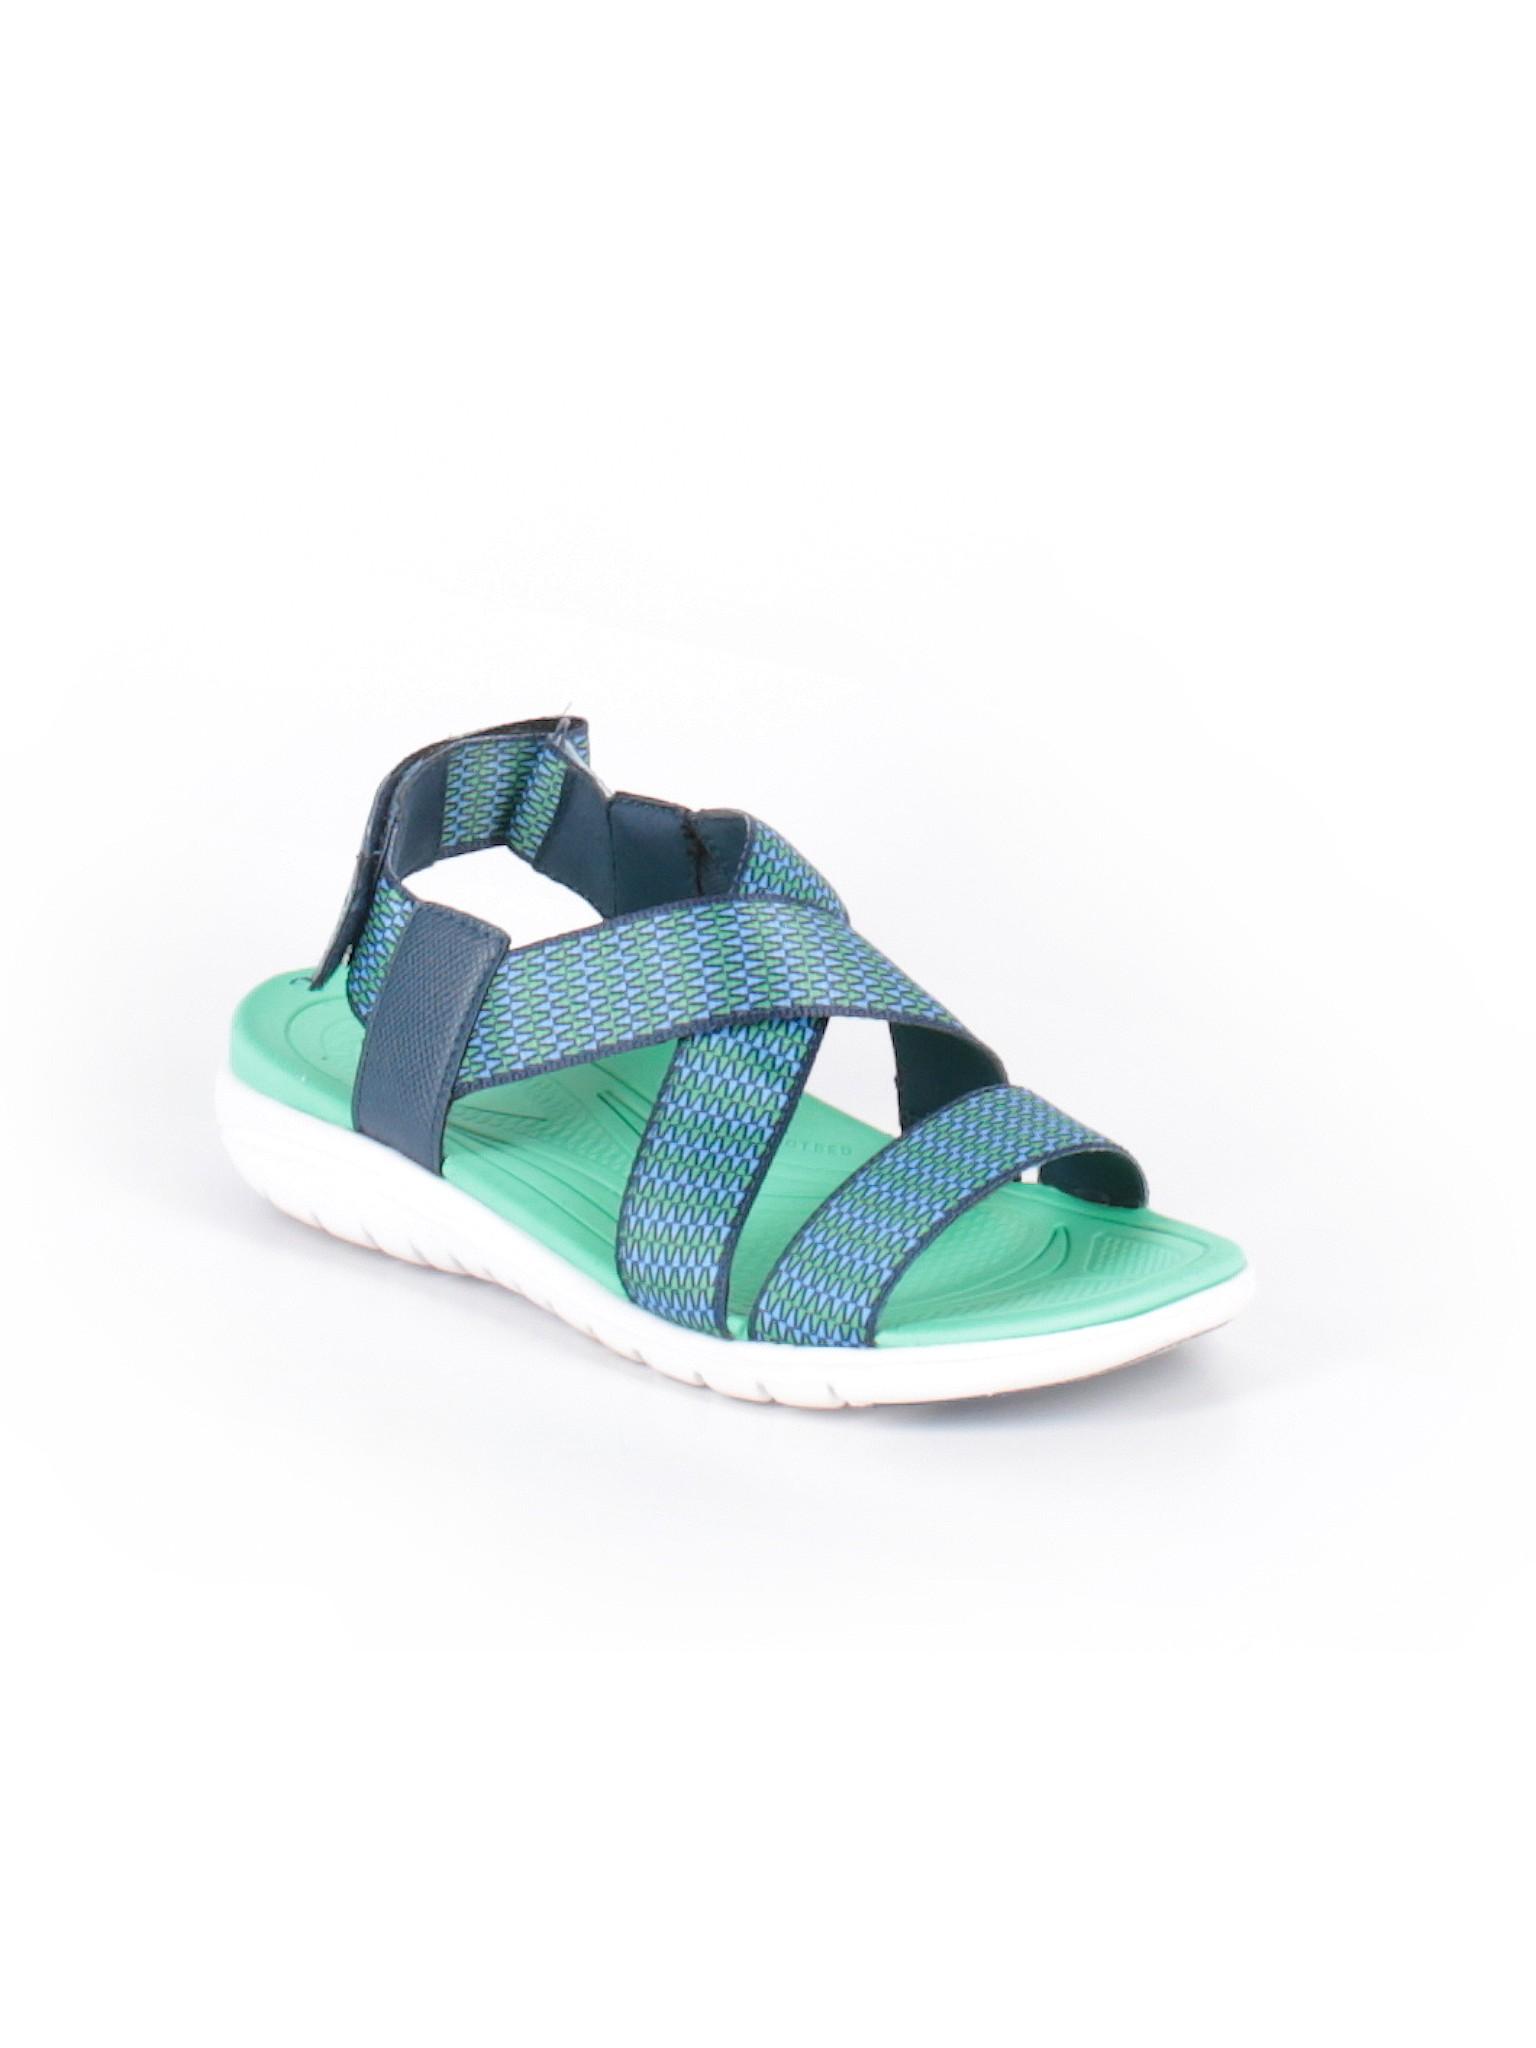 Sandals Boutique promotion Ryka promotion Boutique WFrqIF